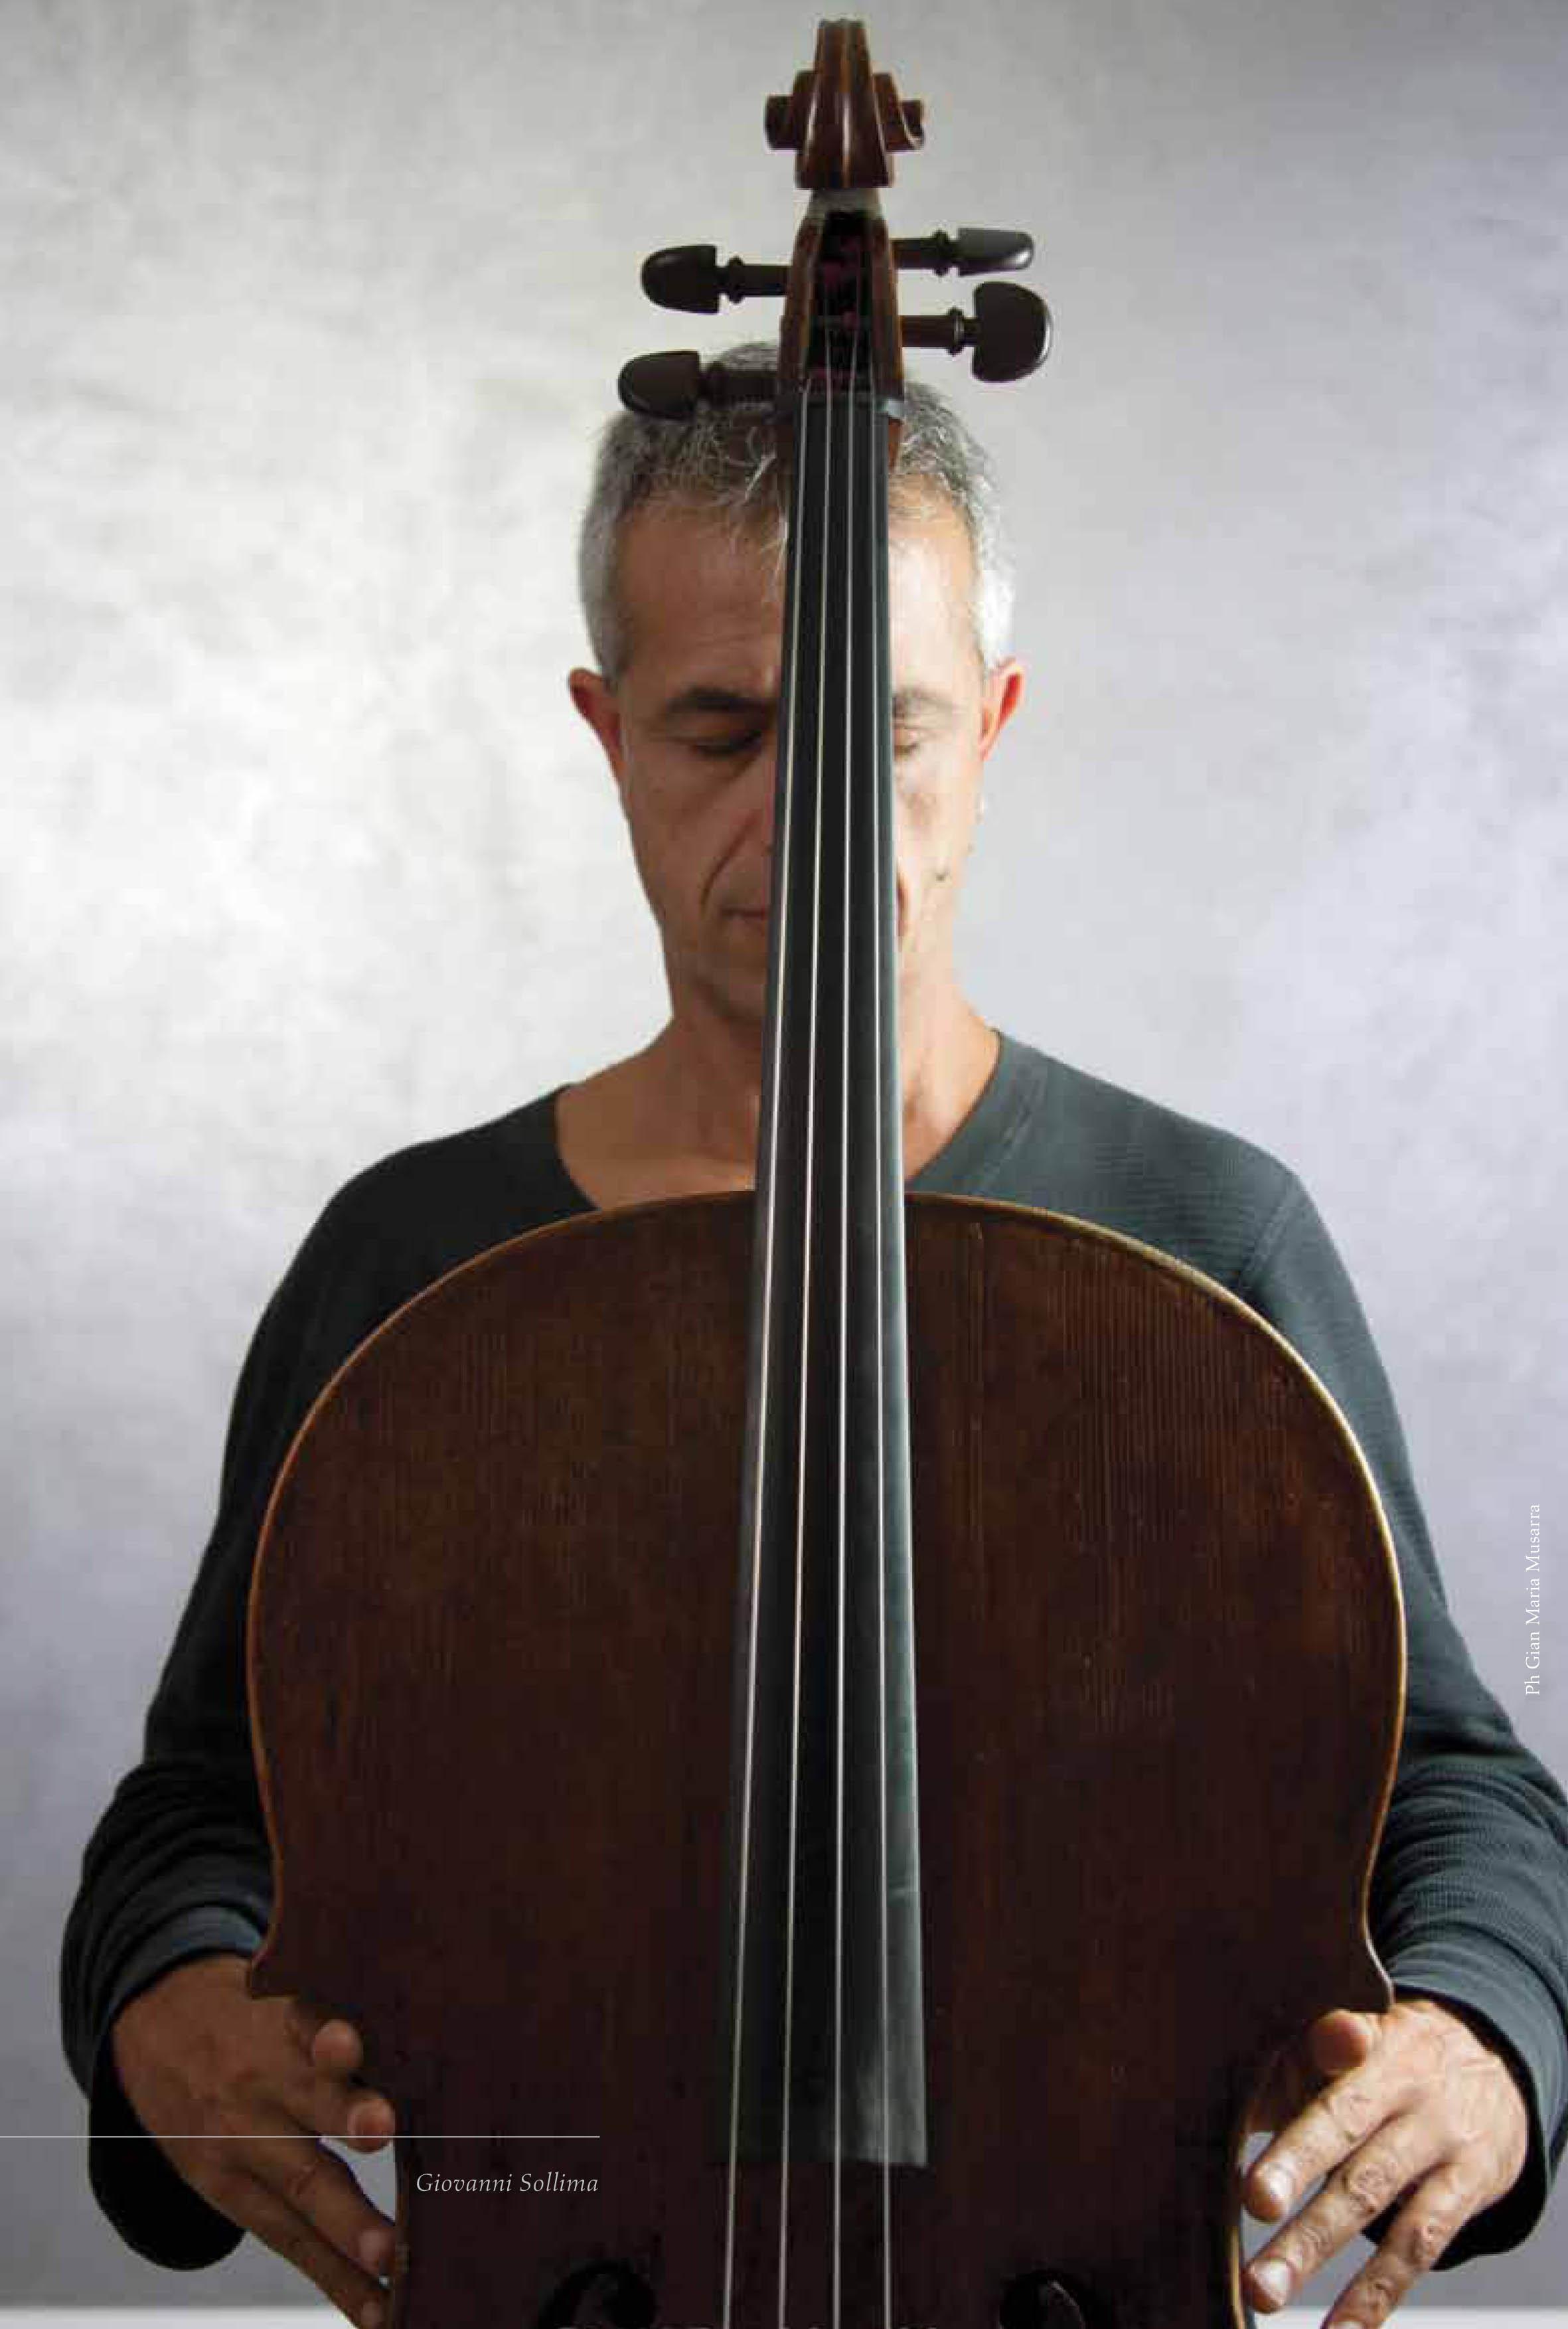 http://www.studiopierrepi.it/wp-content/uploads/2012/05/Giovanni-Sollima-intero.jpg